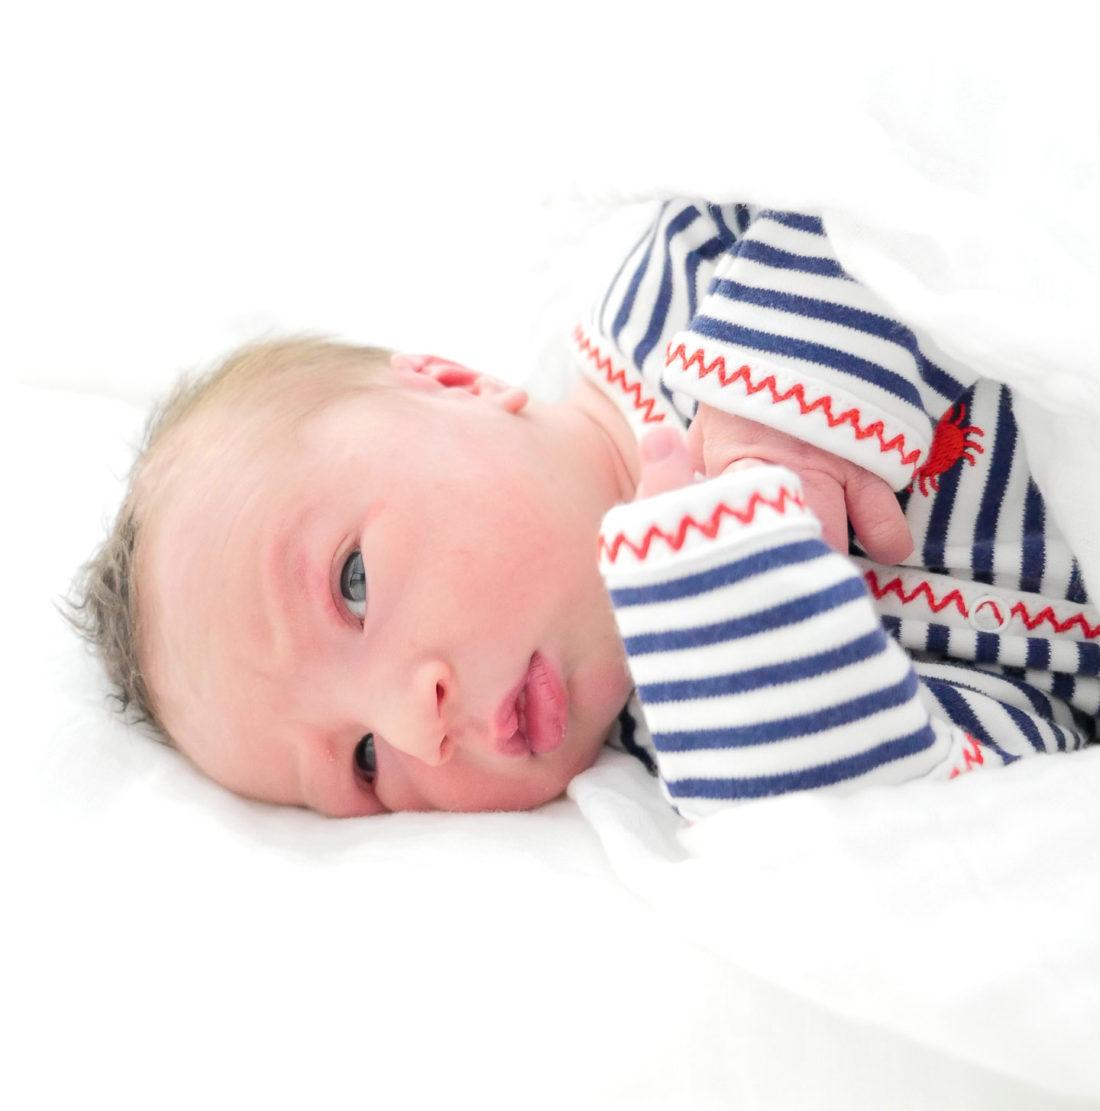 Newborn Major James Martino, son of Eva Amurri Martino and Kyle Martino